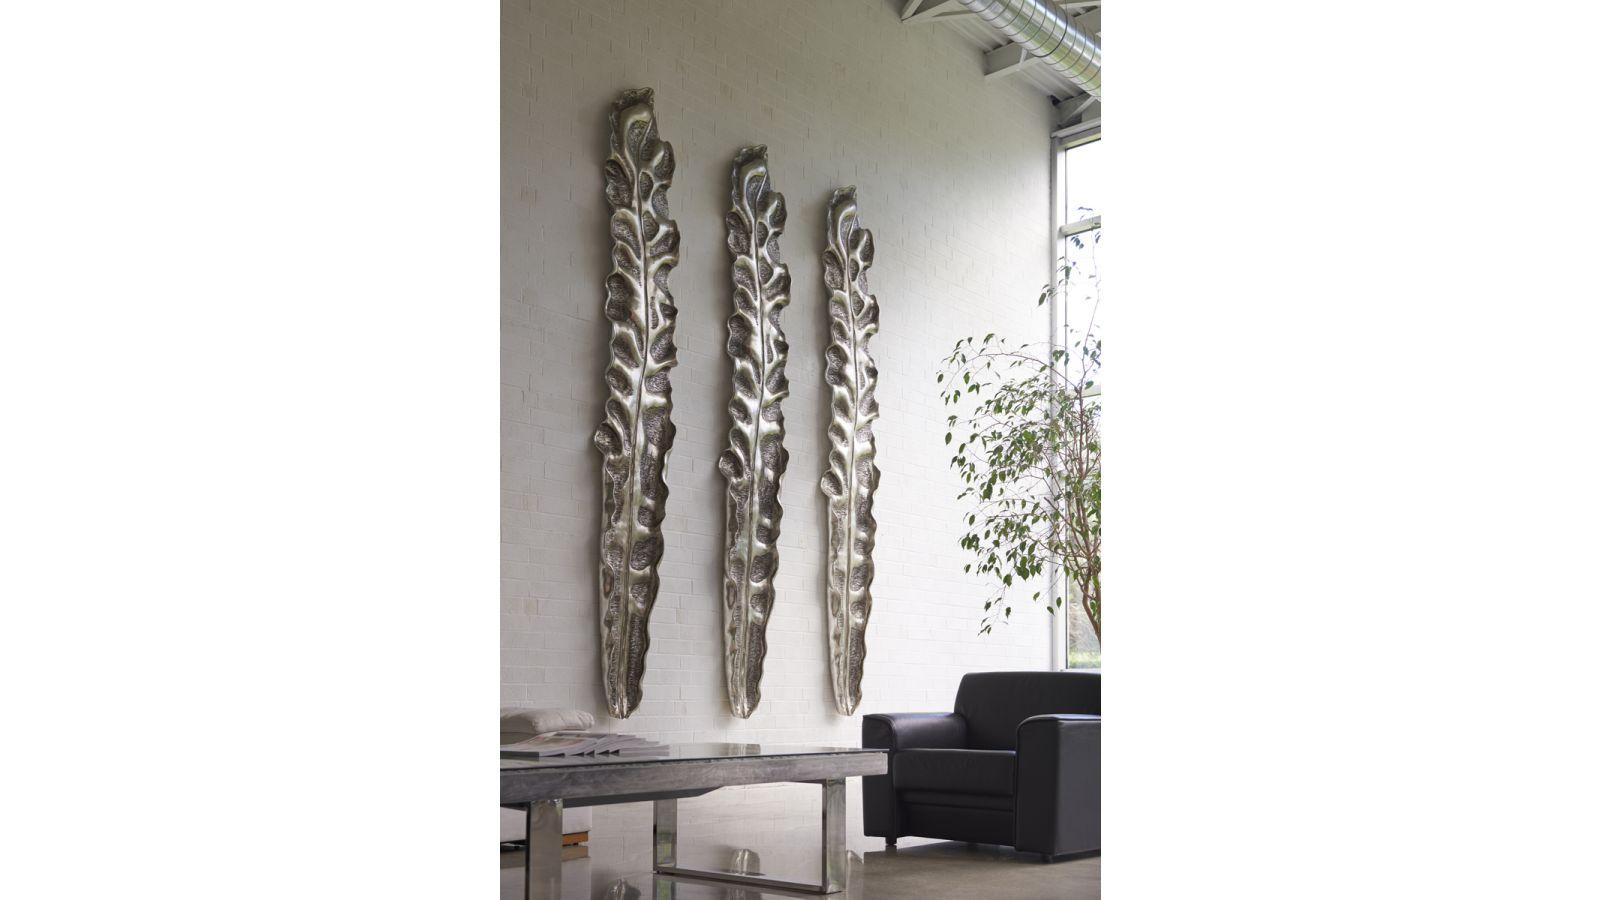 Petiole Leaf Wall Art